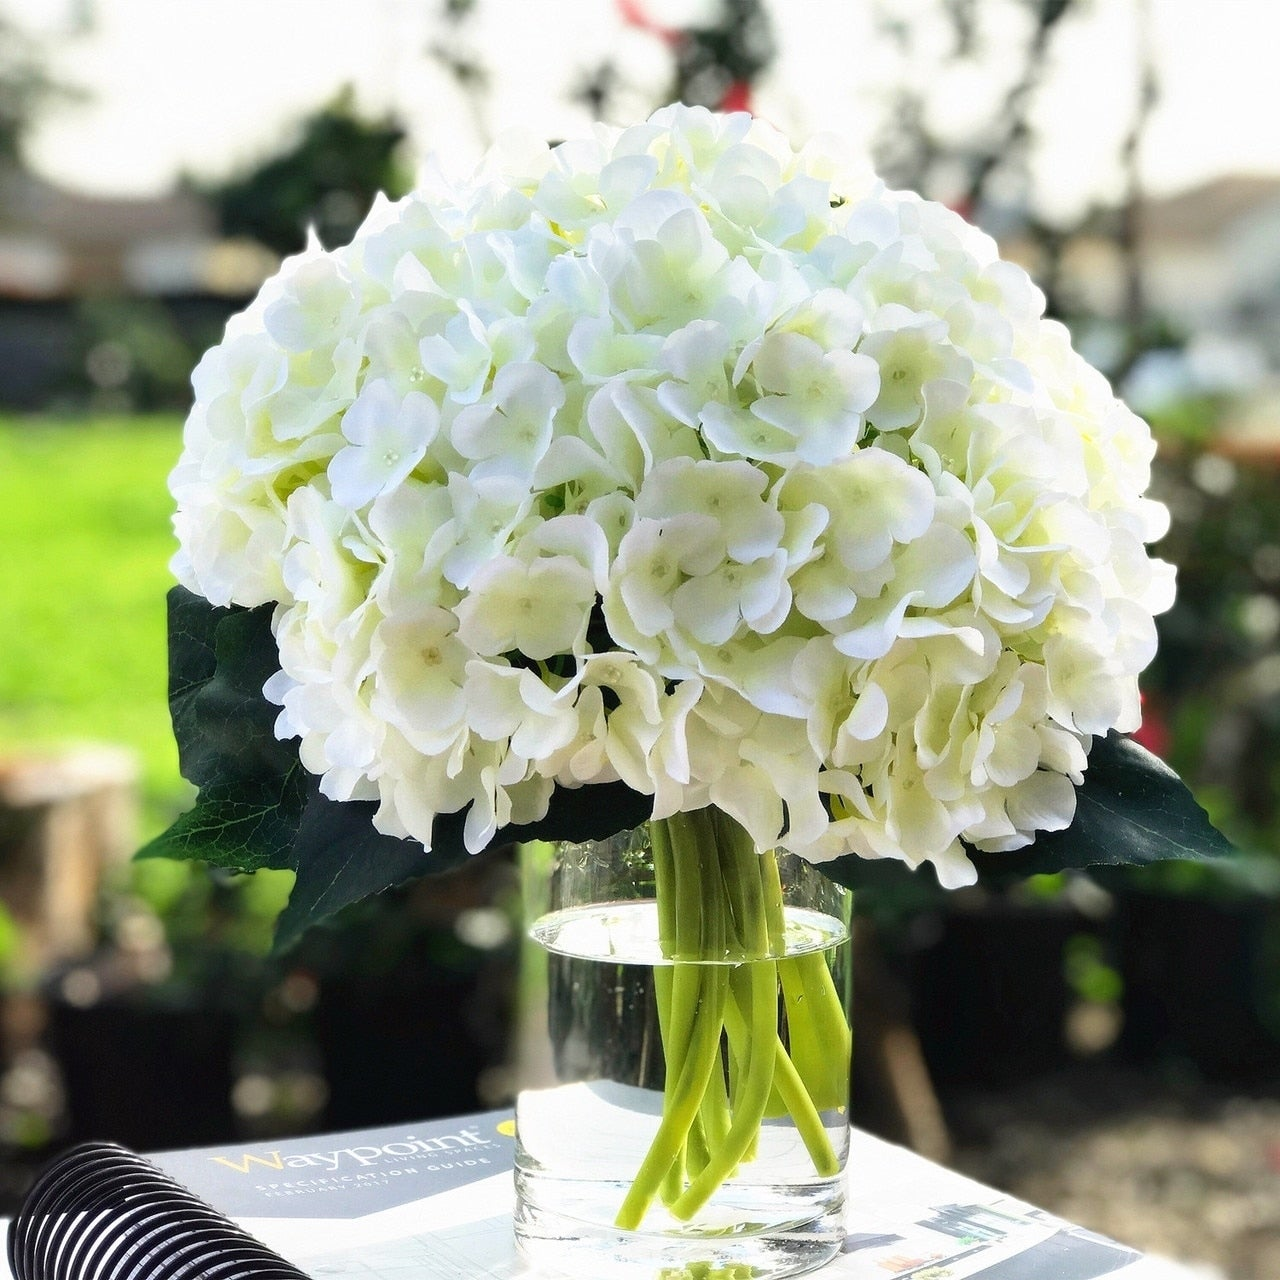 Enova Home Cream Artificial Hydrangea Flower Arrangements with Clear Glass Vase